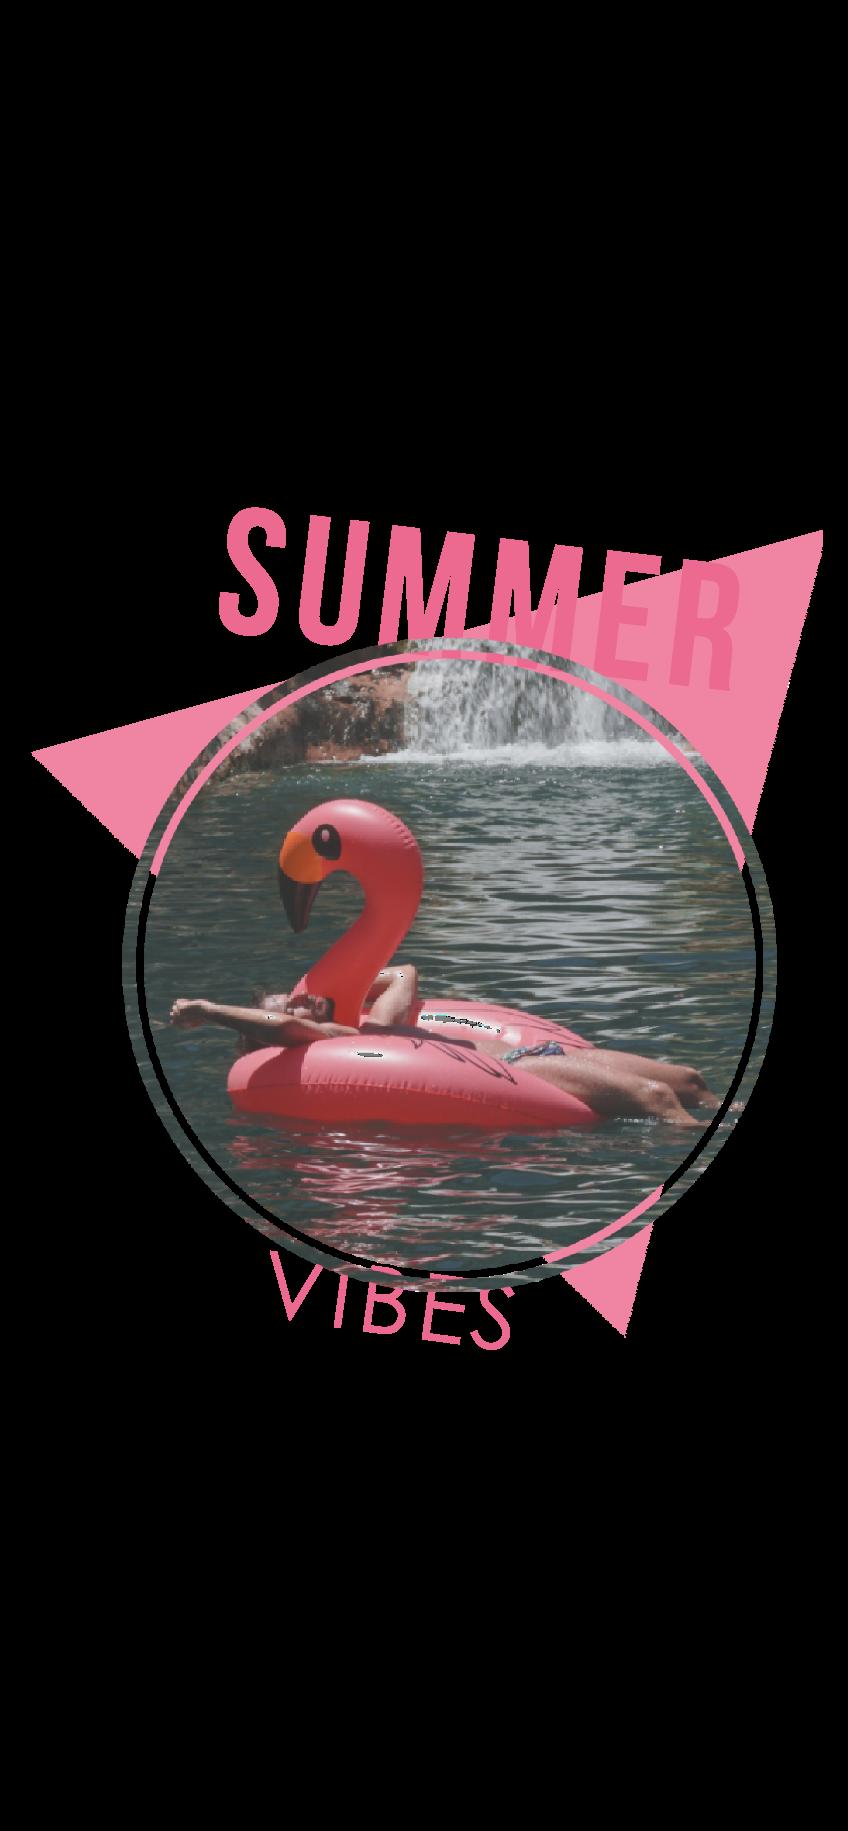 cover summer vibes tu marzamemi